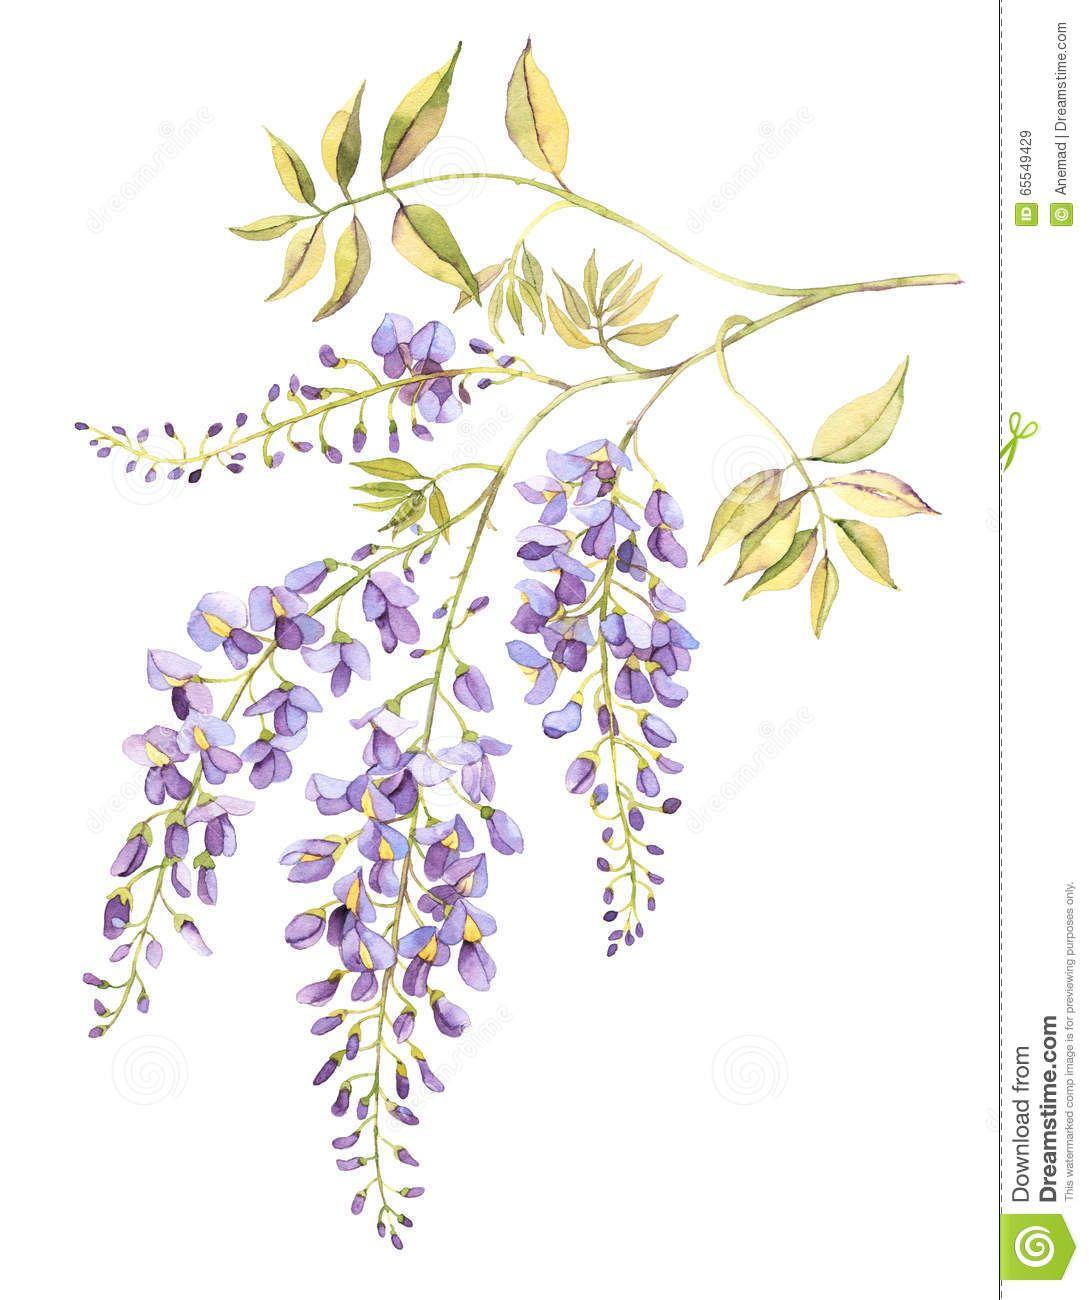 Immagine correlata | Шаблоны | Дерево глицинии, Рисунки ...